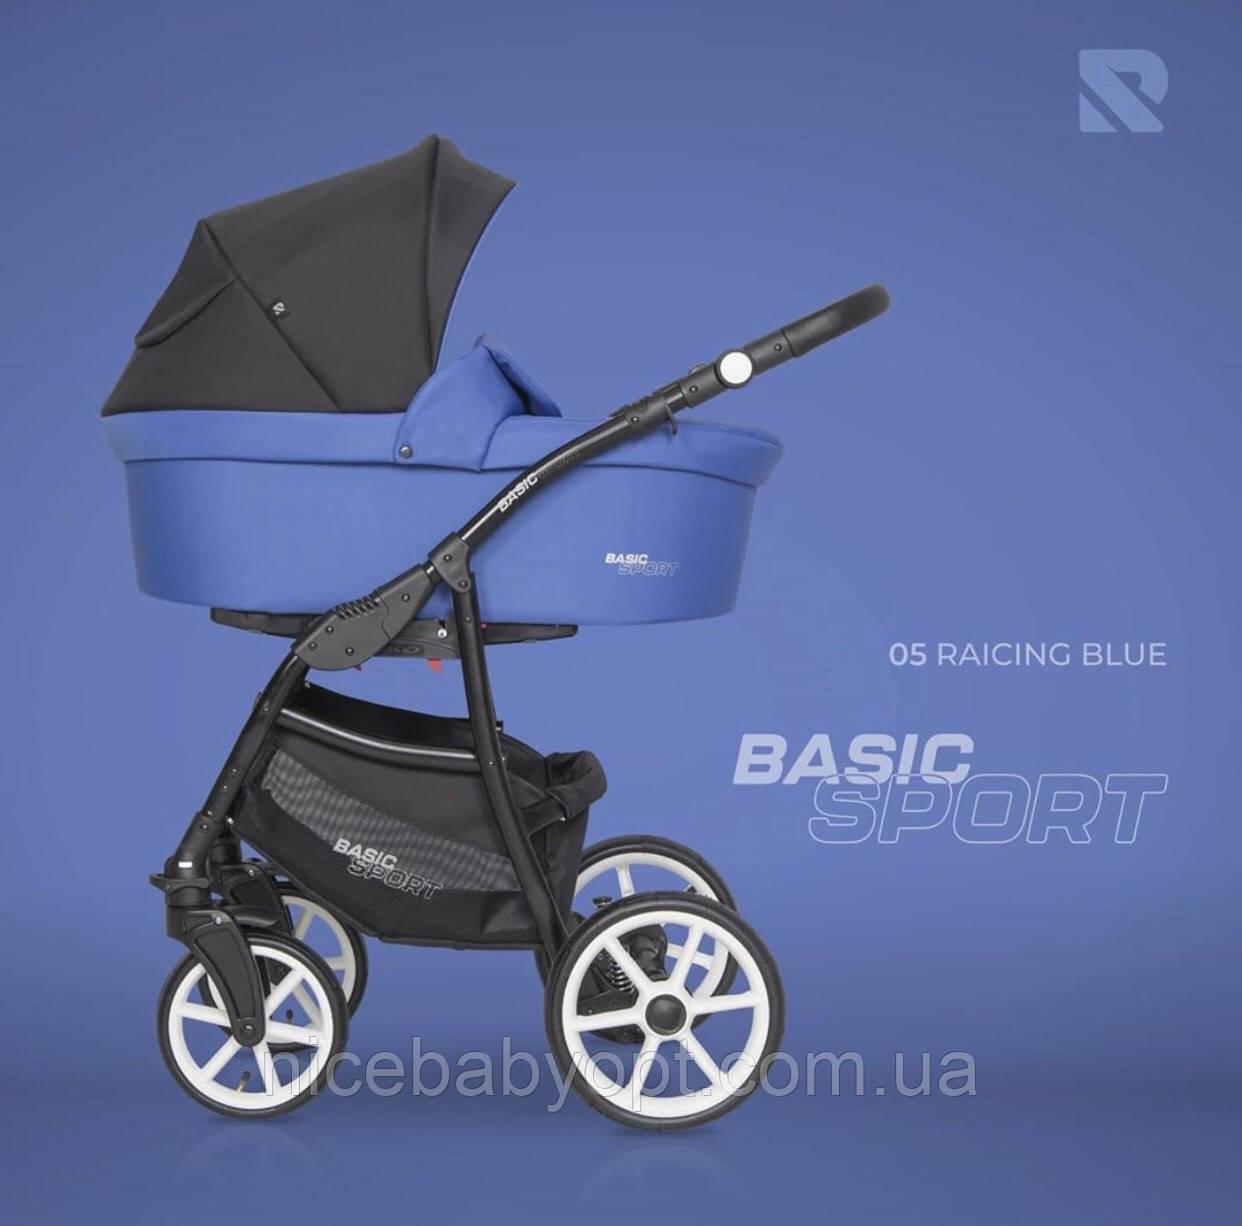 Riko Basic Sport 05 Raicing Blue